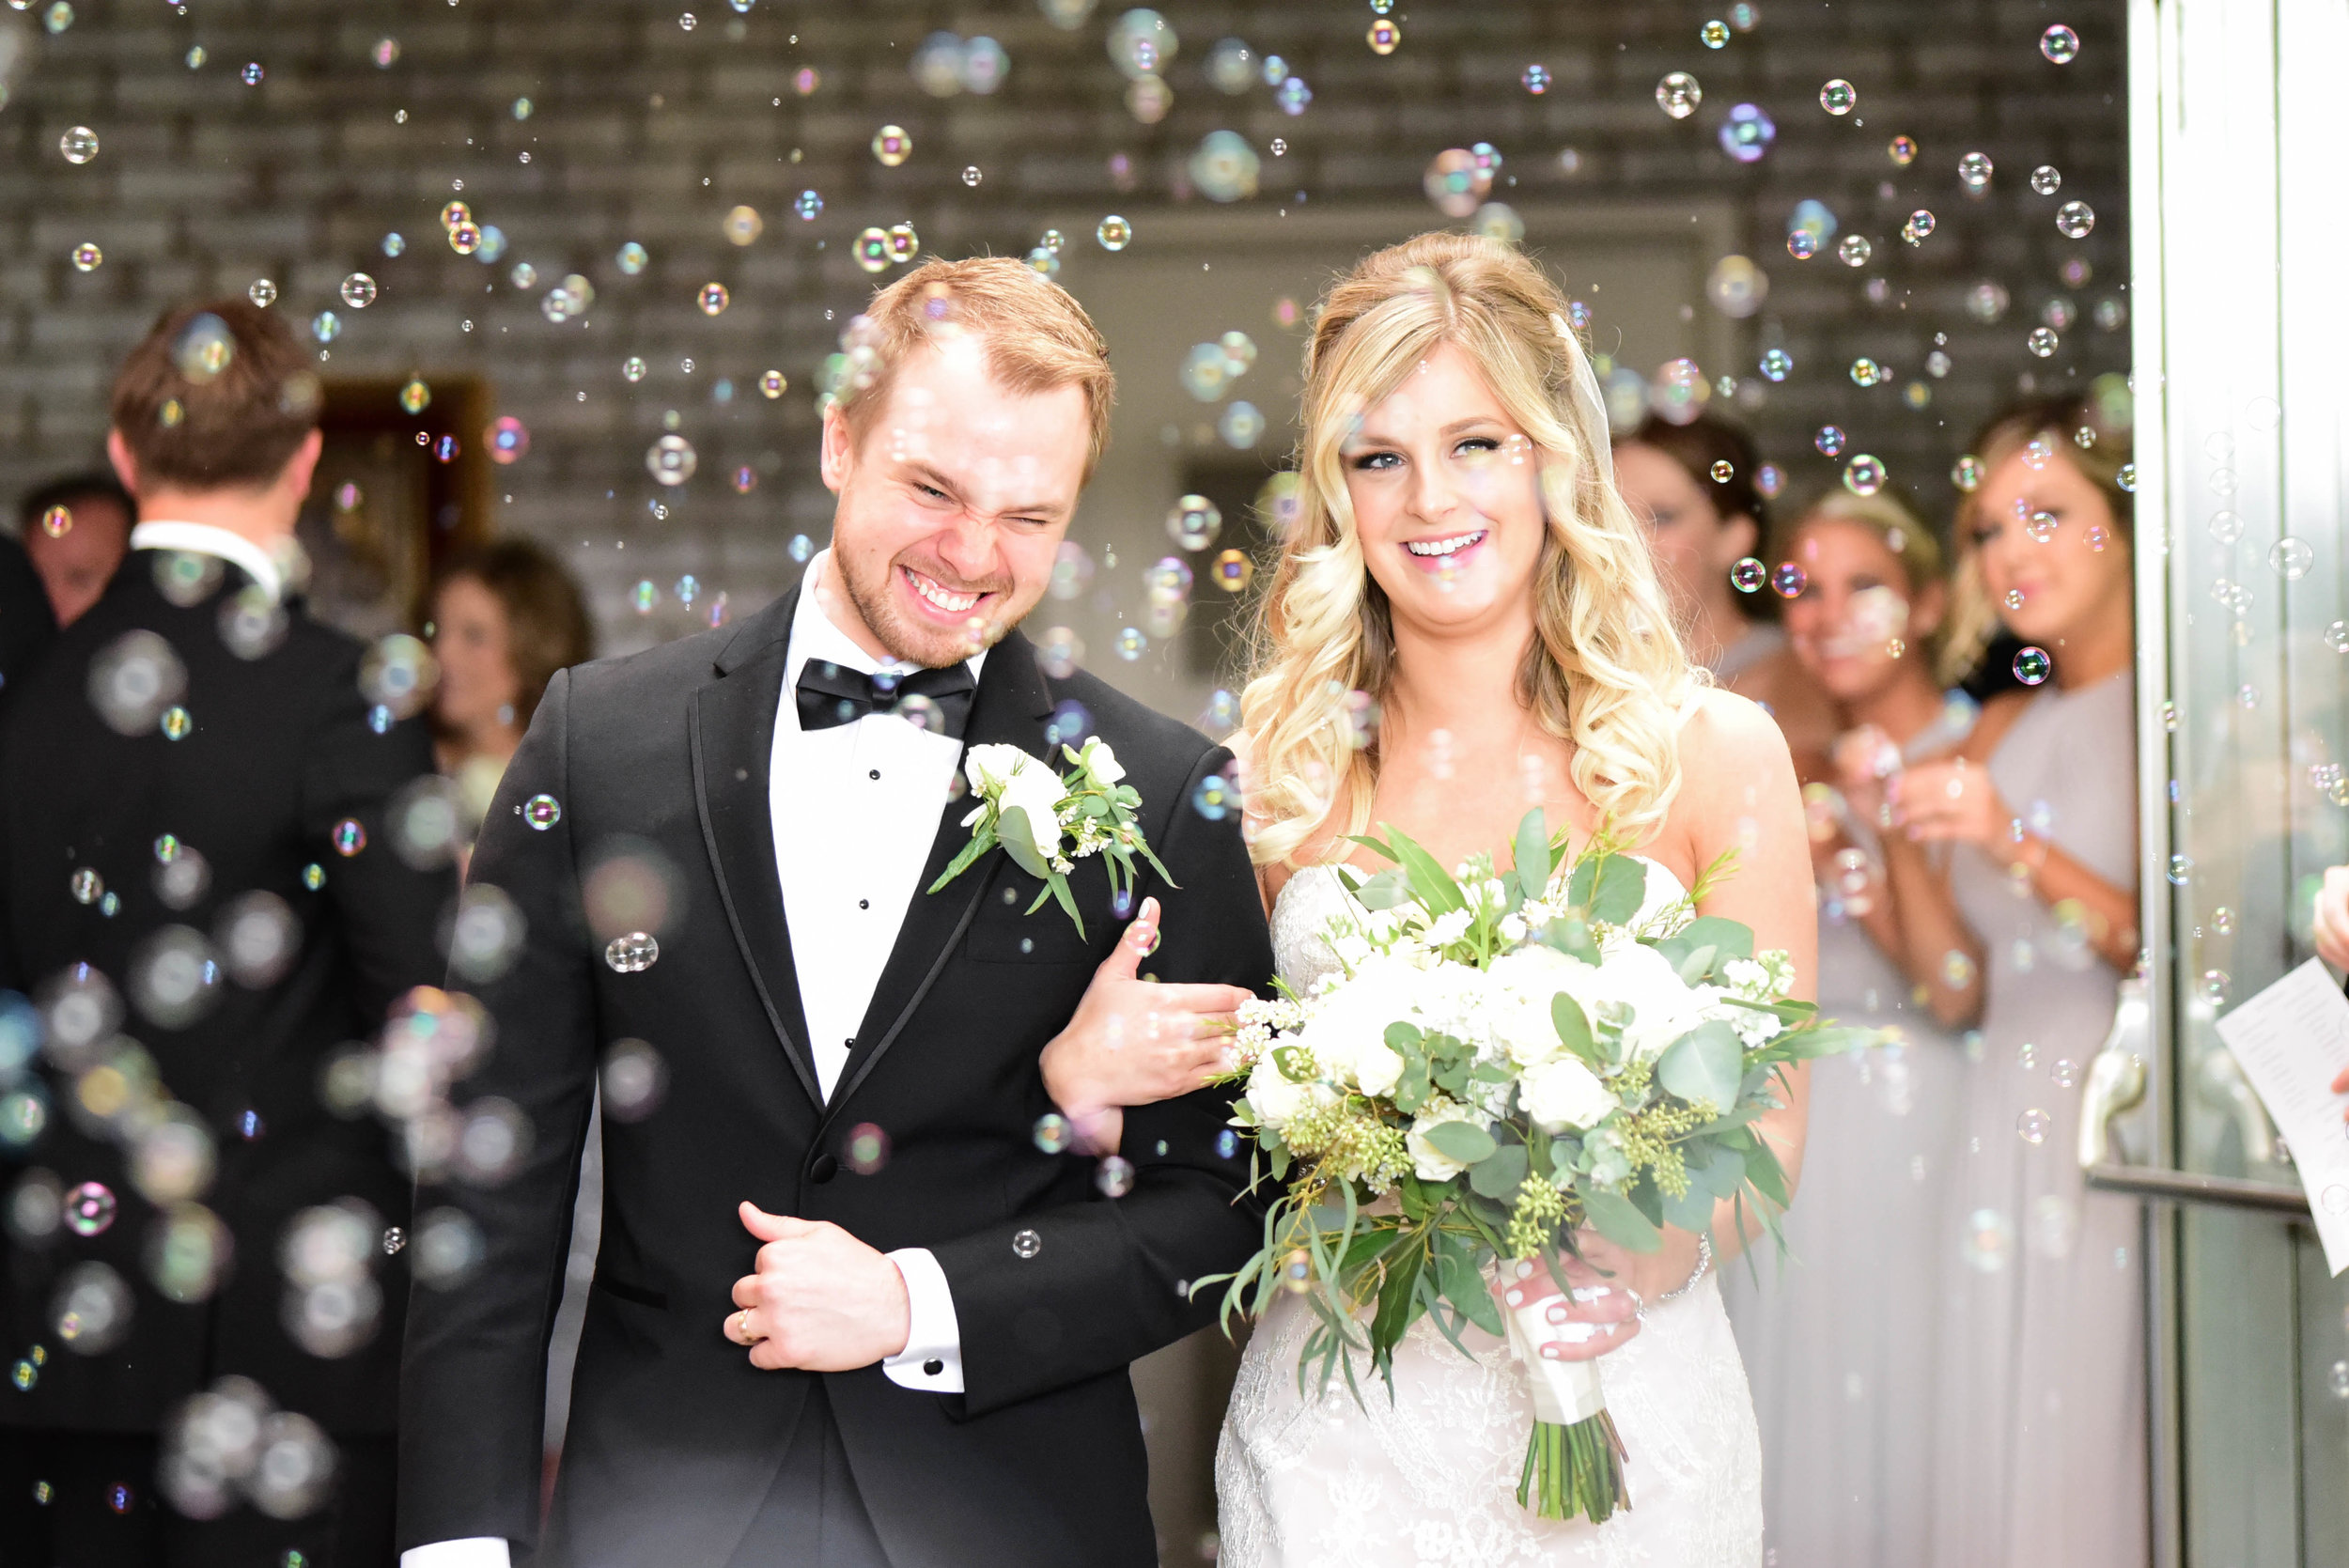 Dustin Rachel Cleveland Wedding 34.jpg